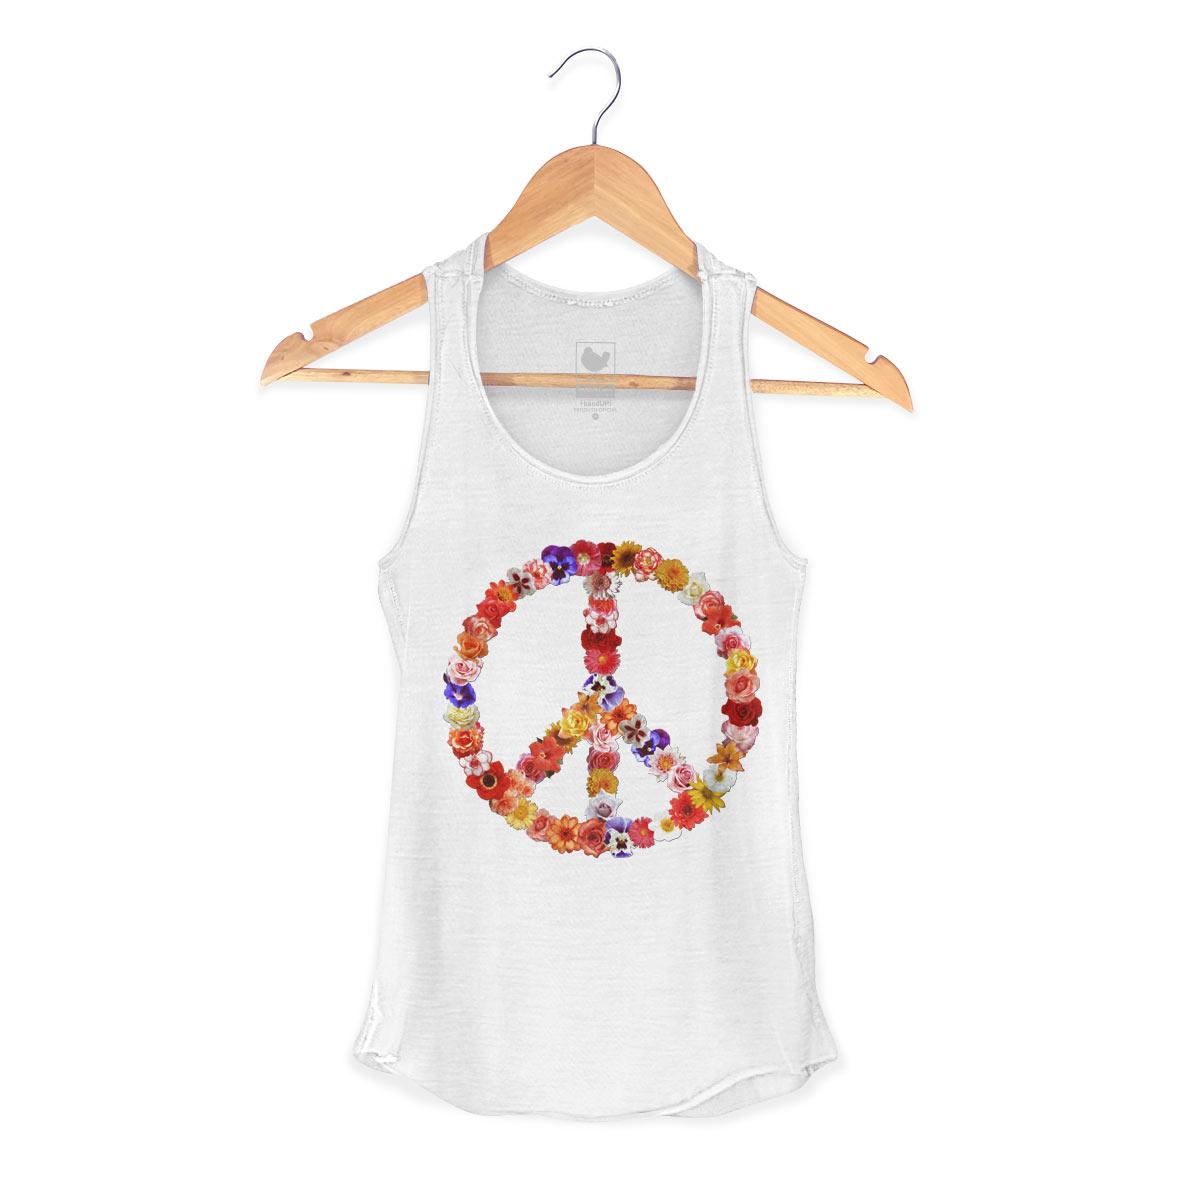 Regata Premium Feminina Woodstock Flower Power